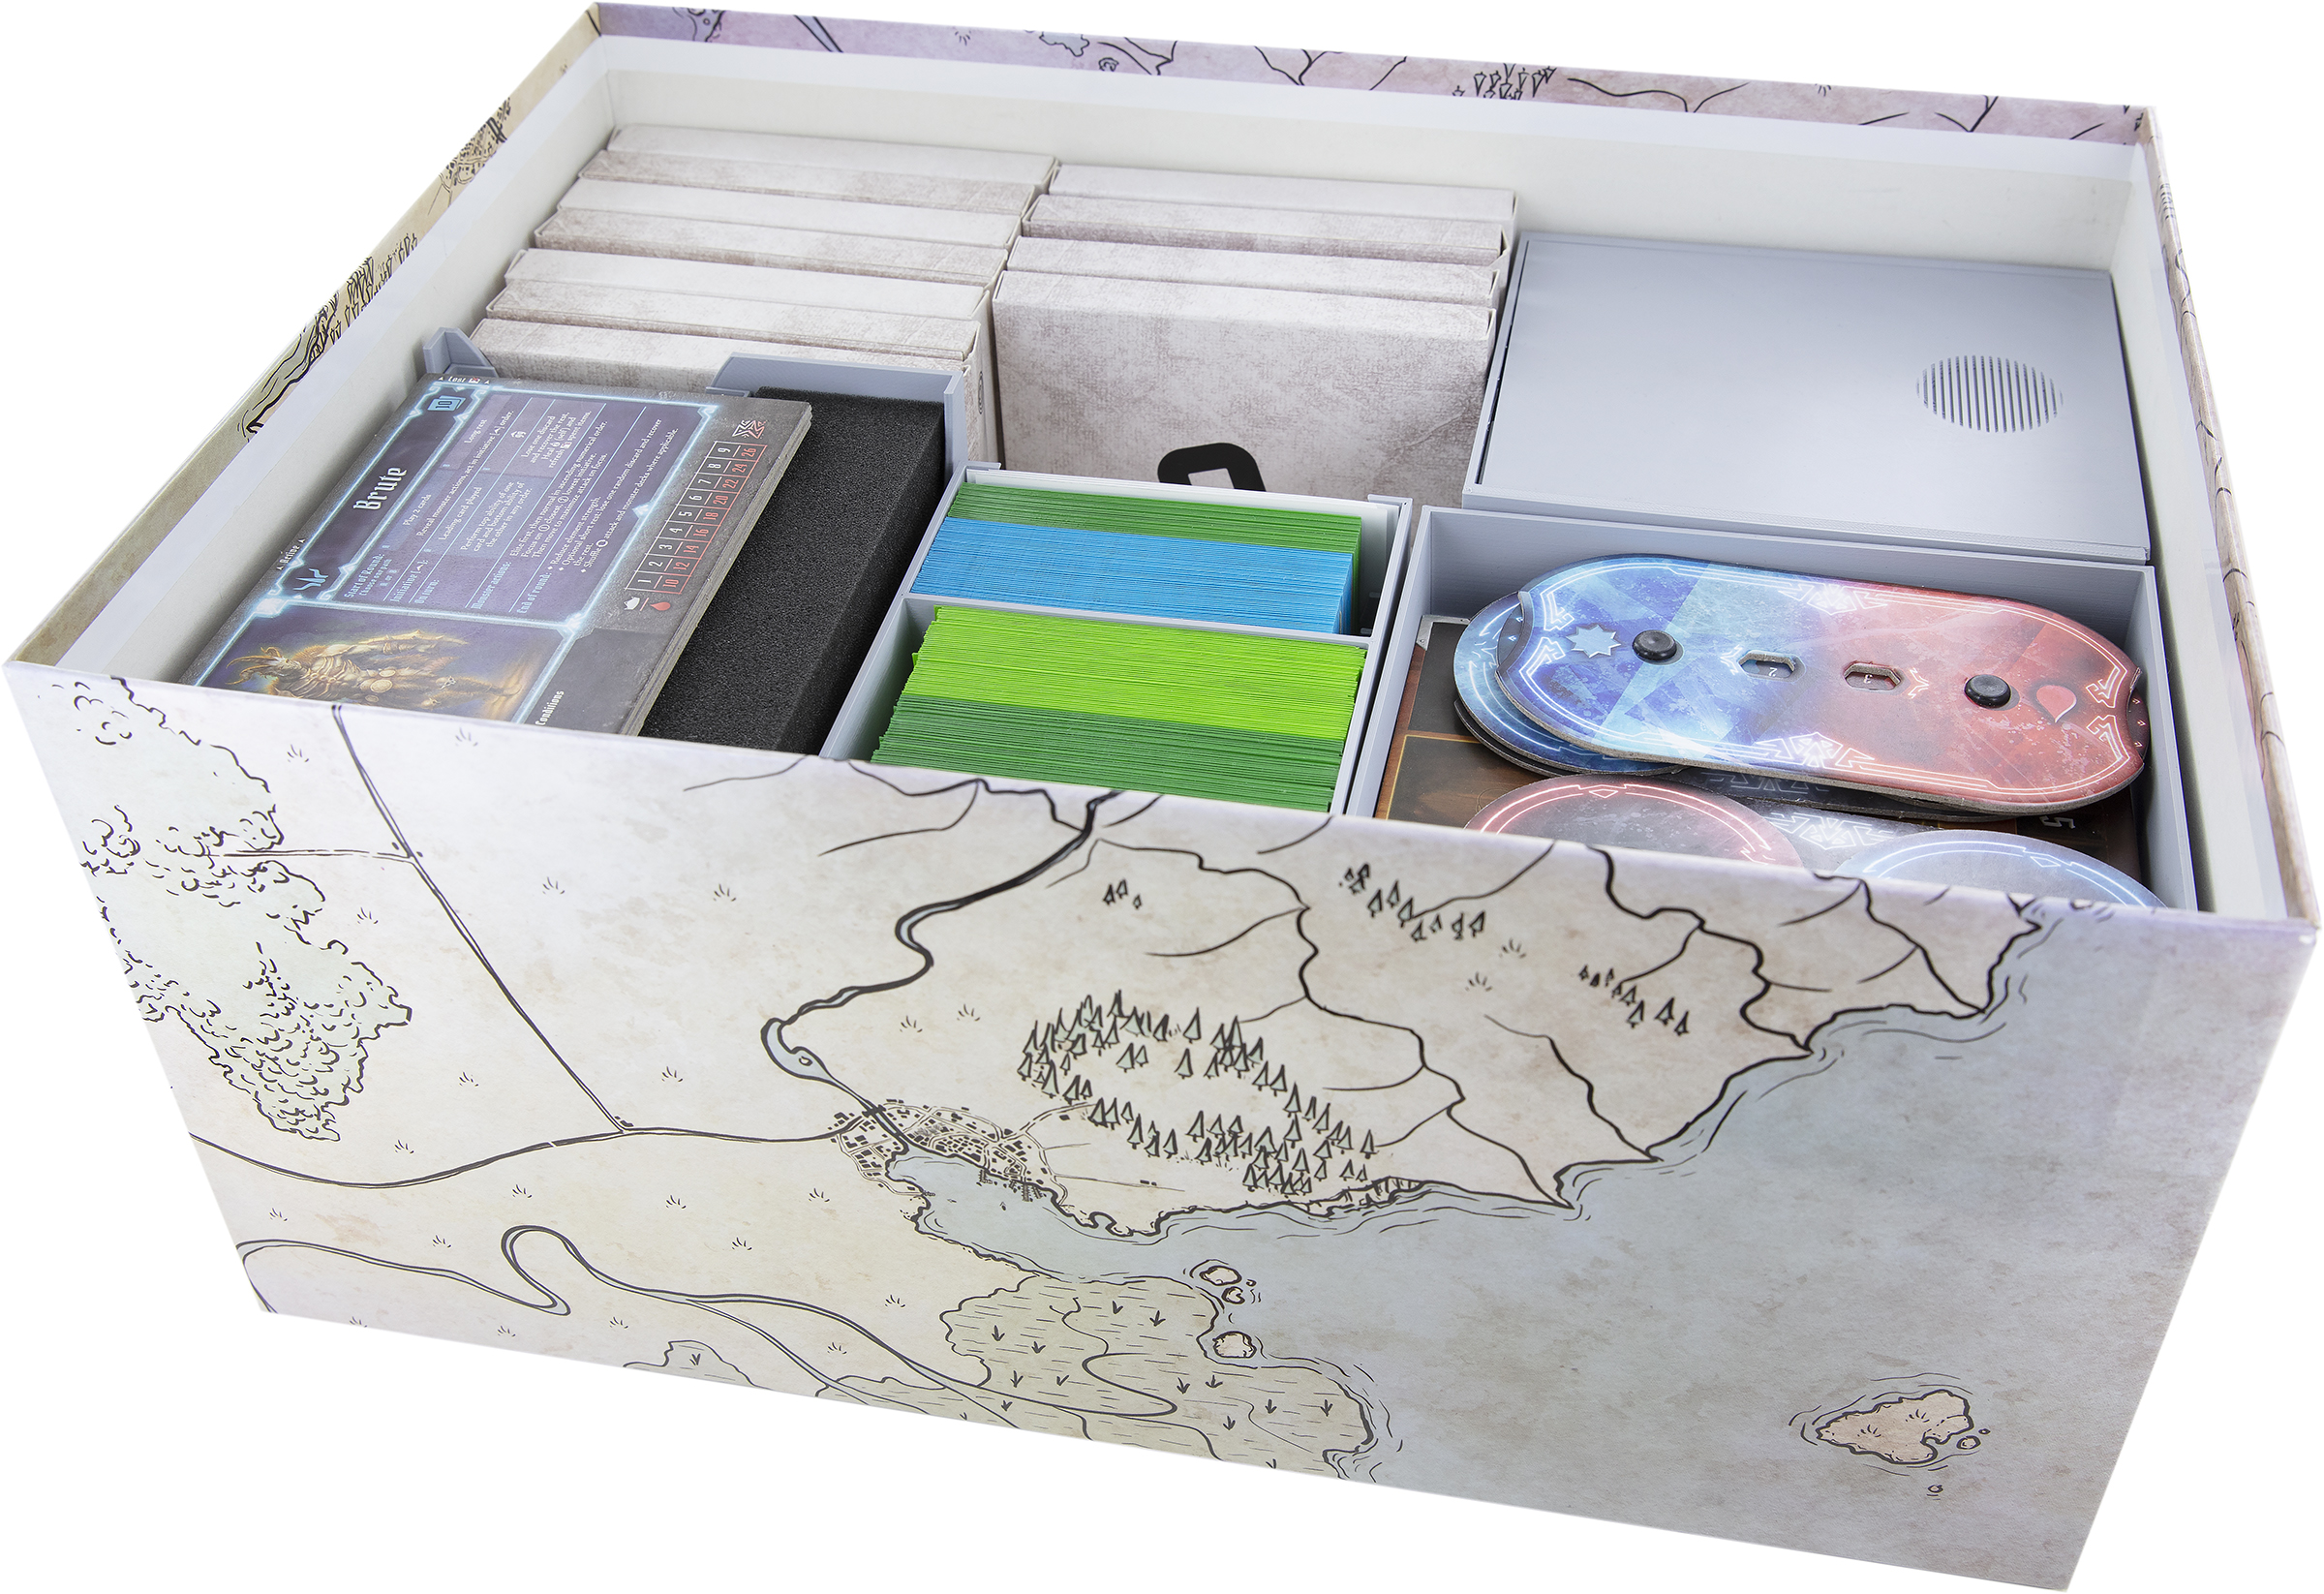 Feldherr Organizer + foam insert for Gloomhaven - board game box